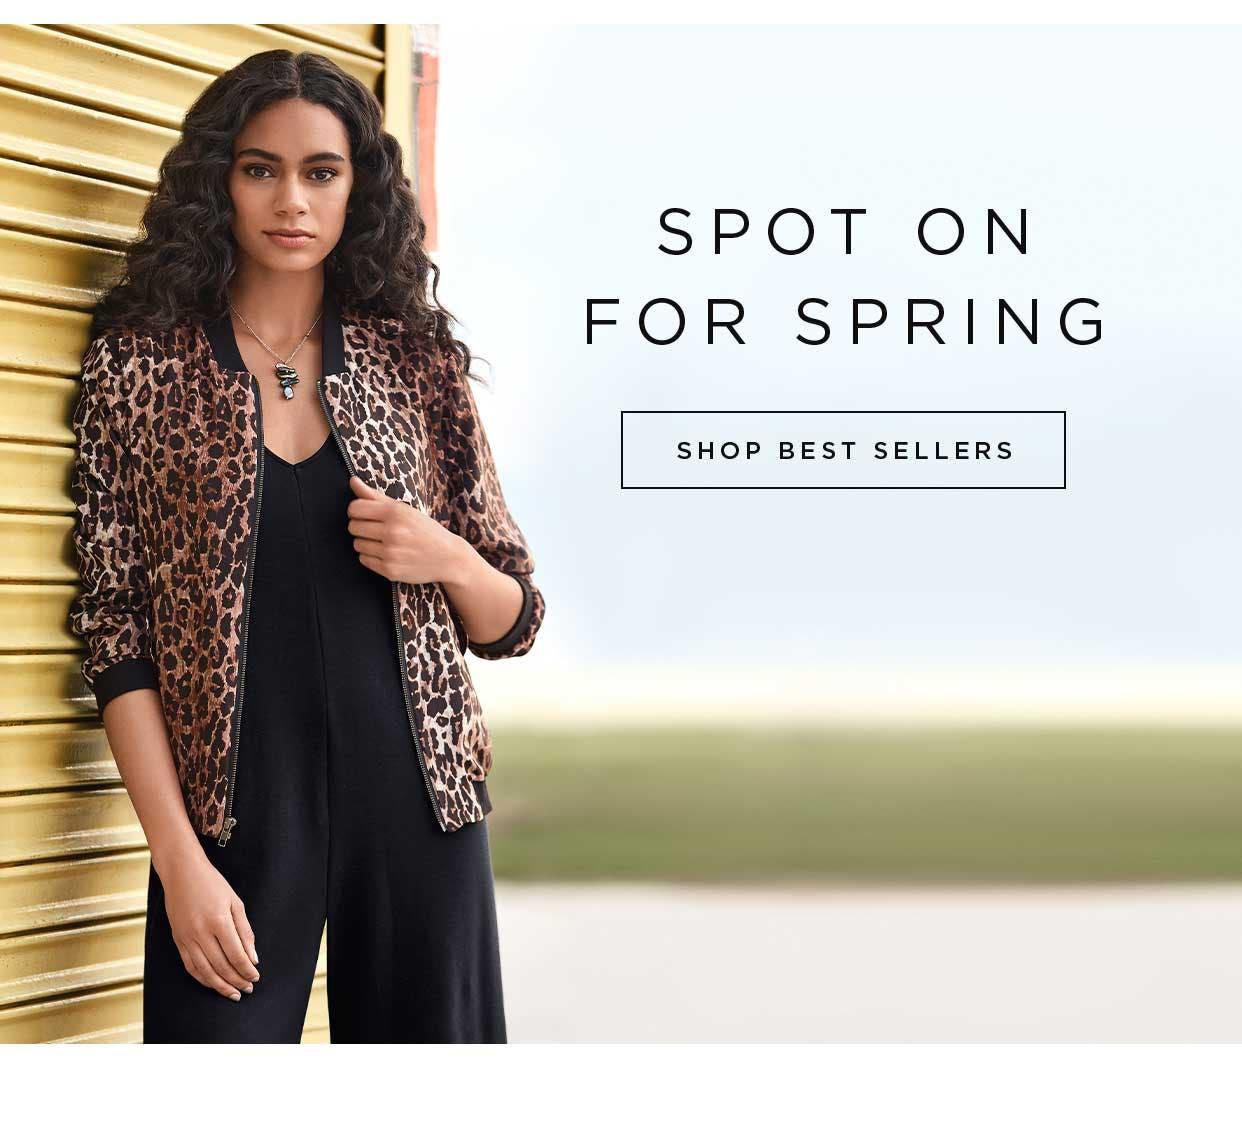 Spot on for Spring - Shop Best Sellers